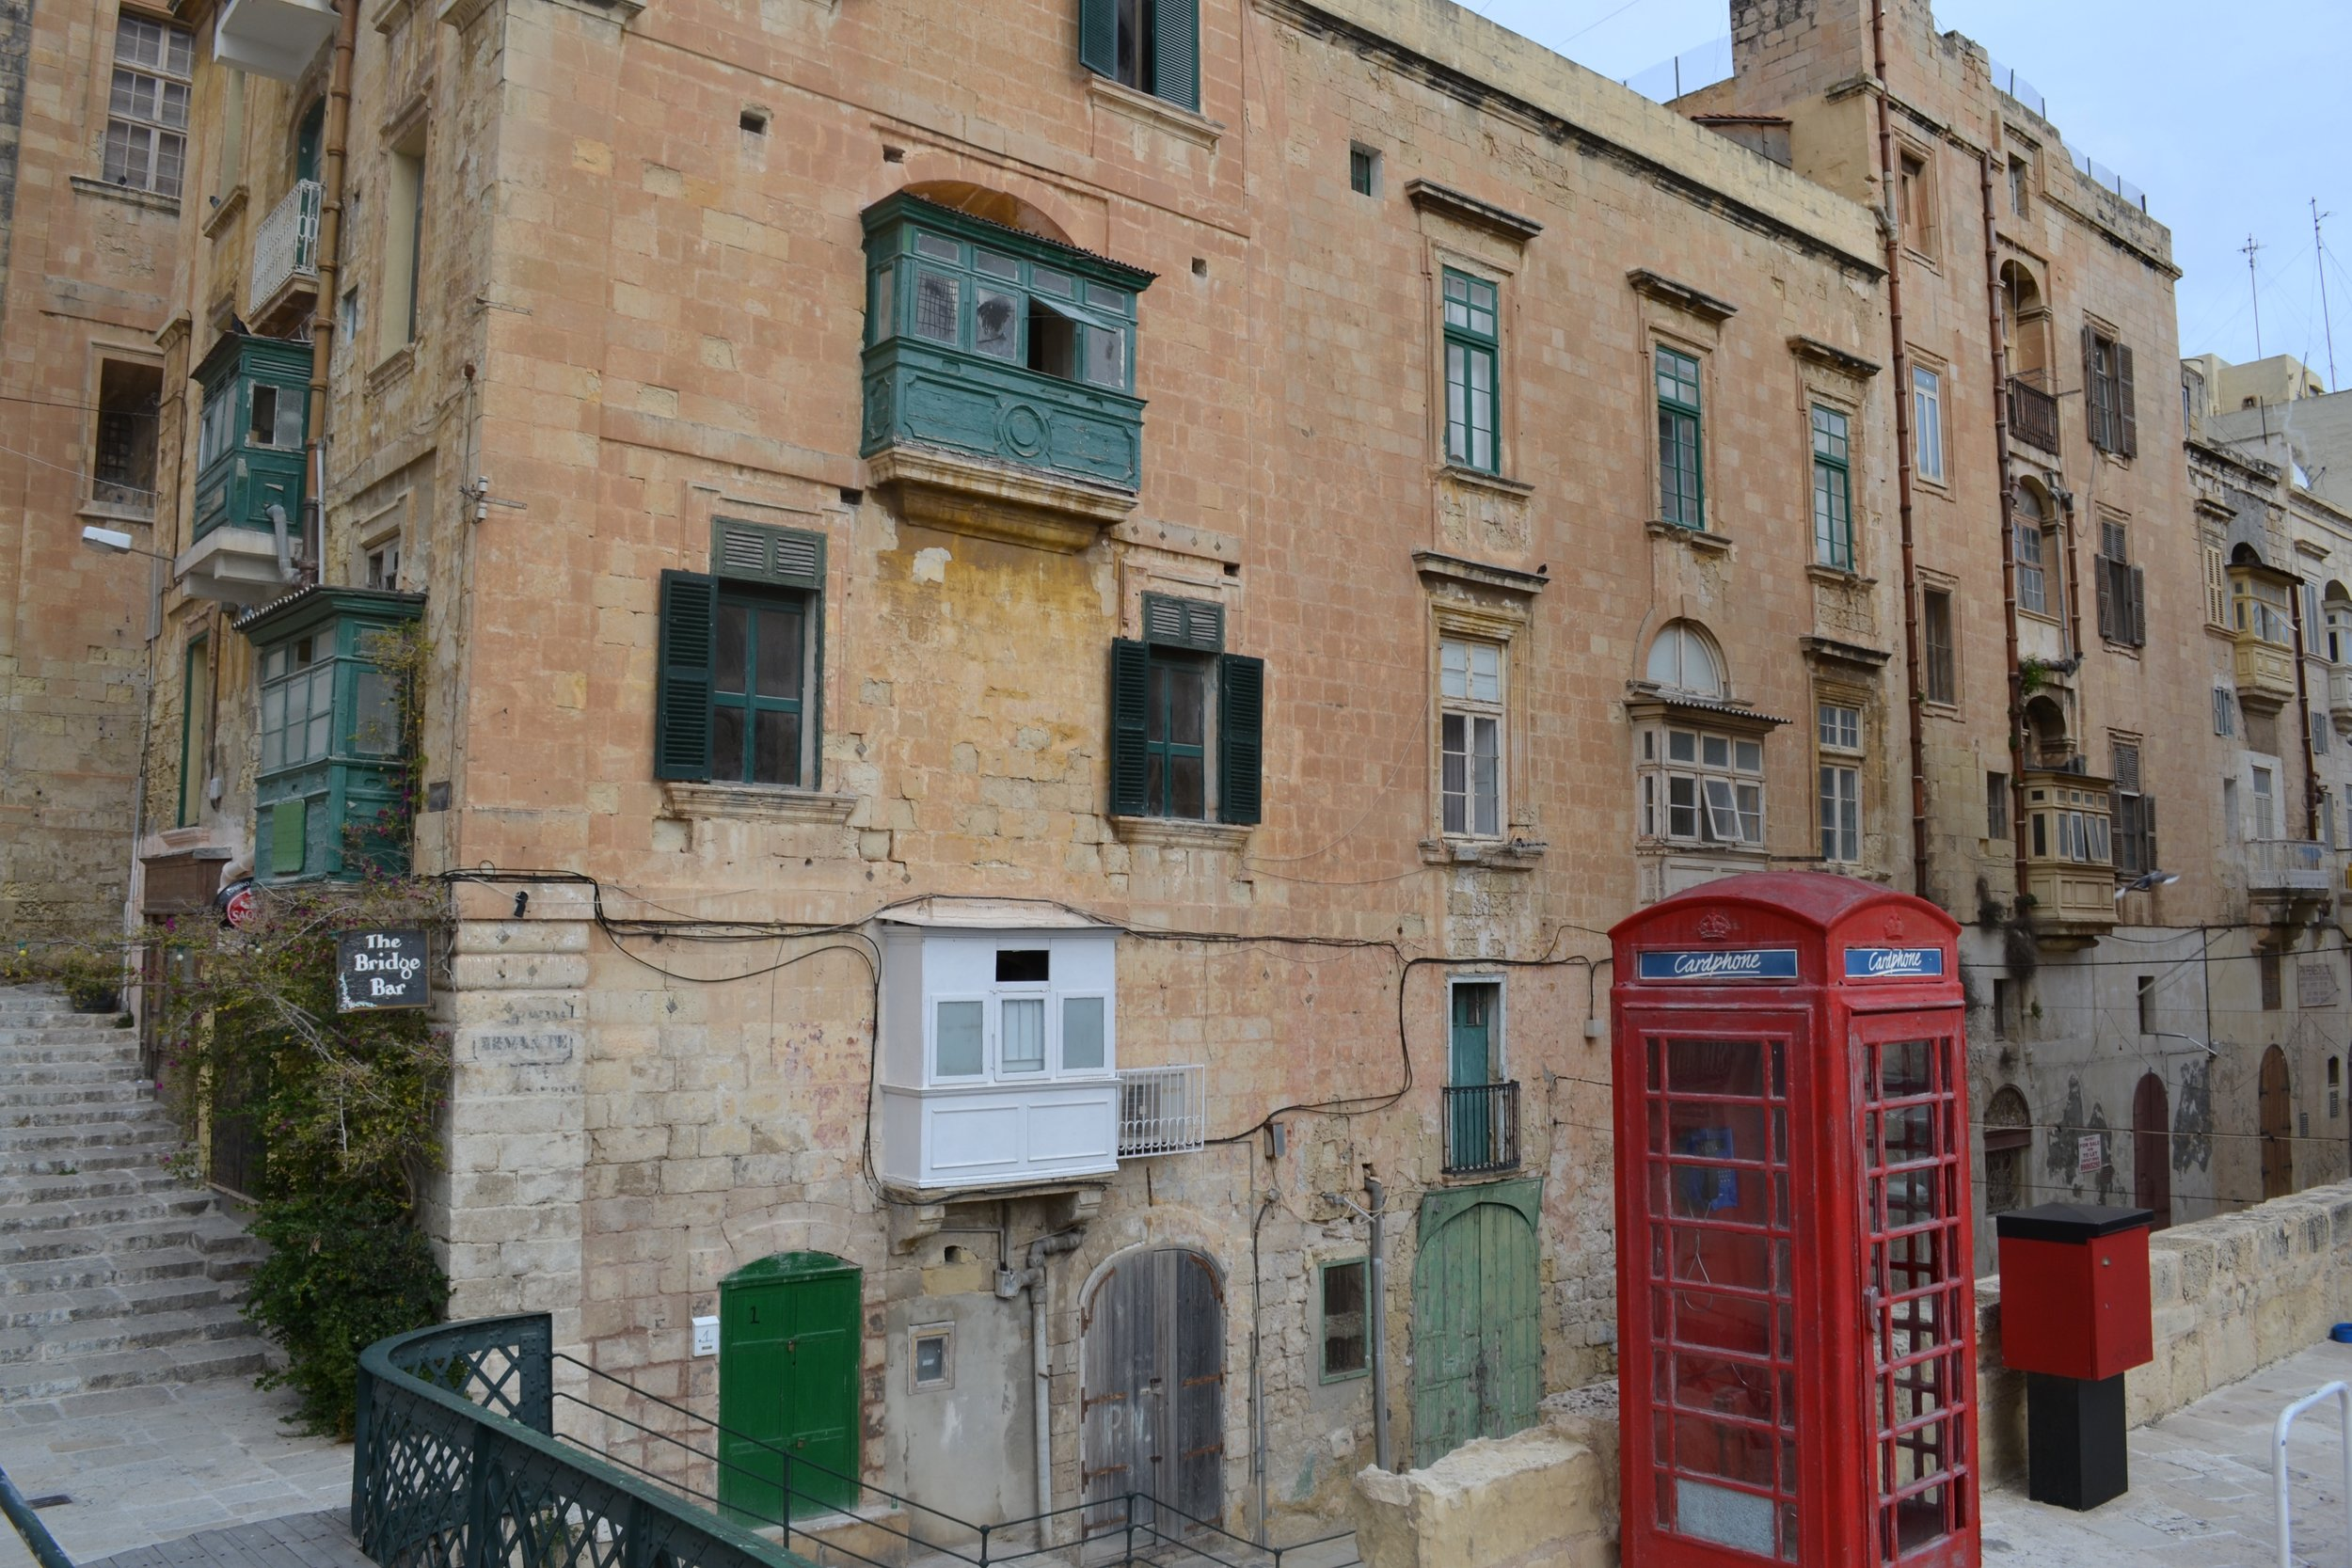 A street in Valletta, Malta